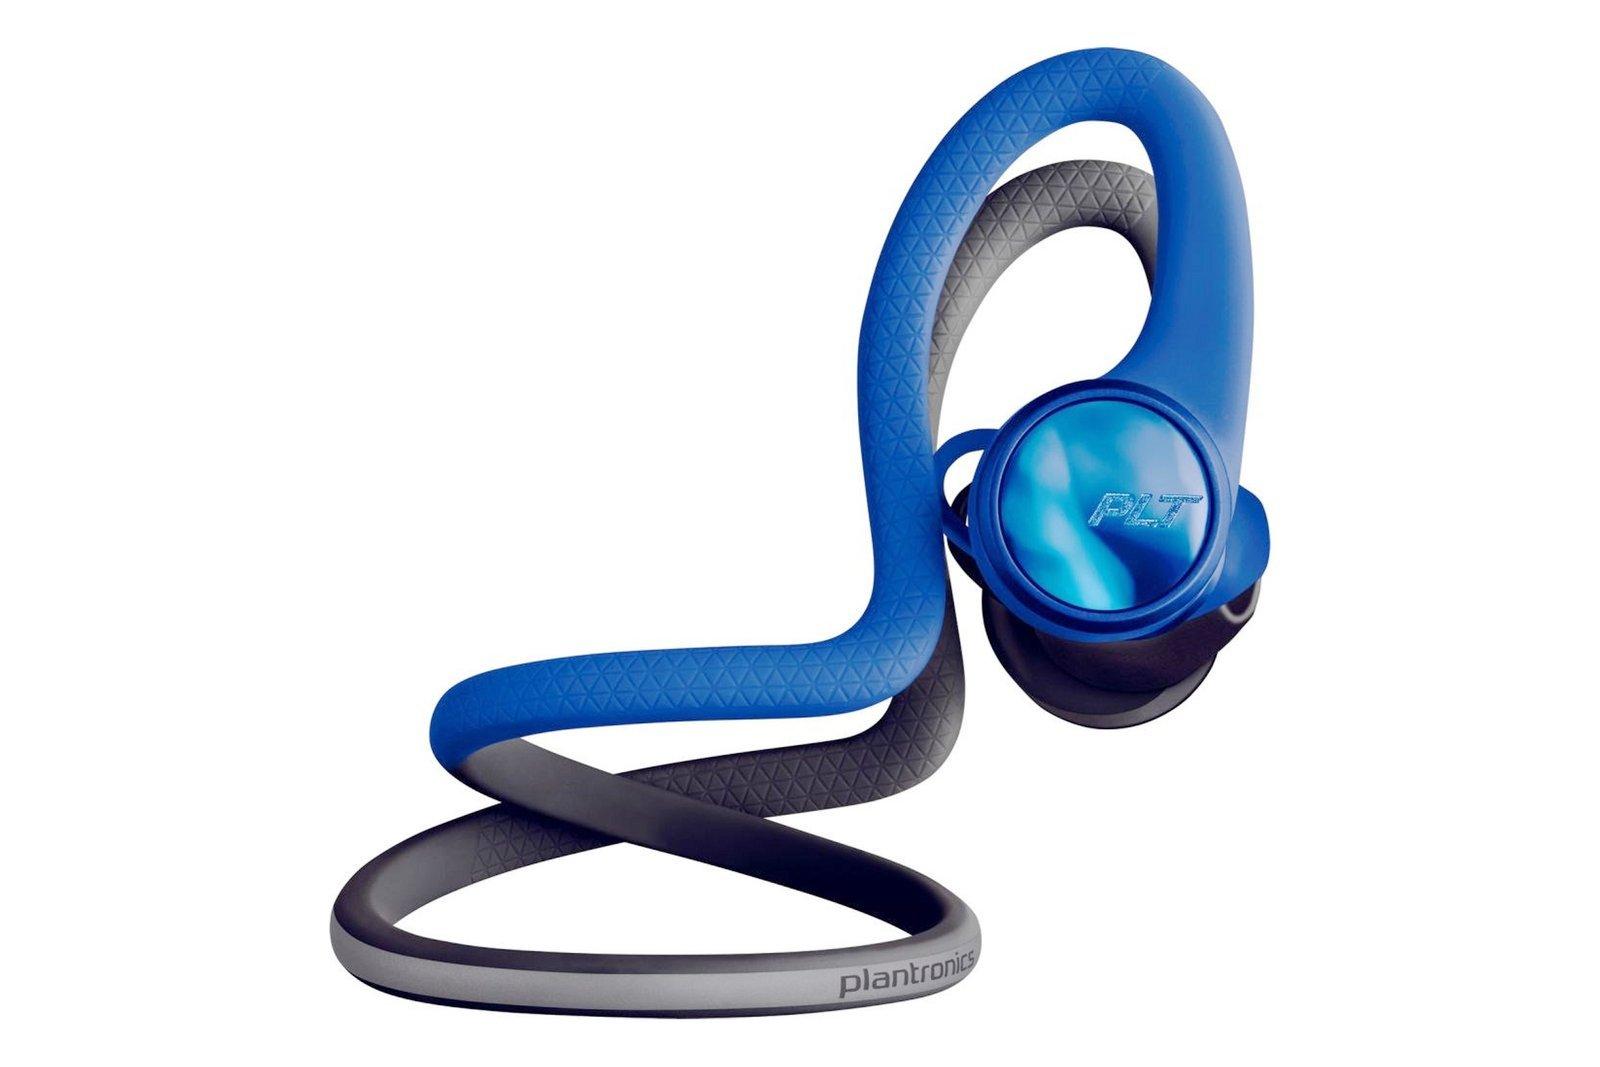 Plantronics BackBeat FIT 2100 Wireless Sport Headphones Blue